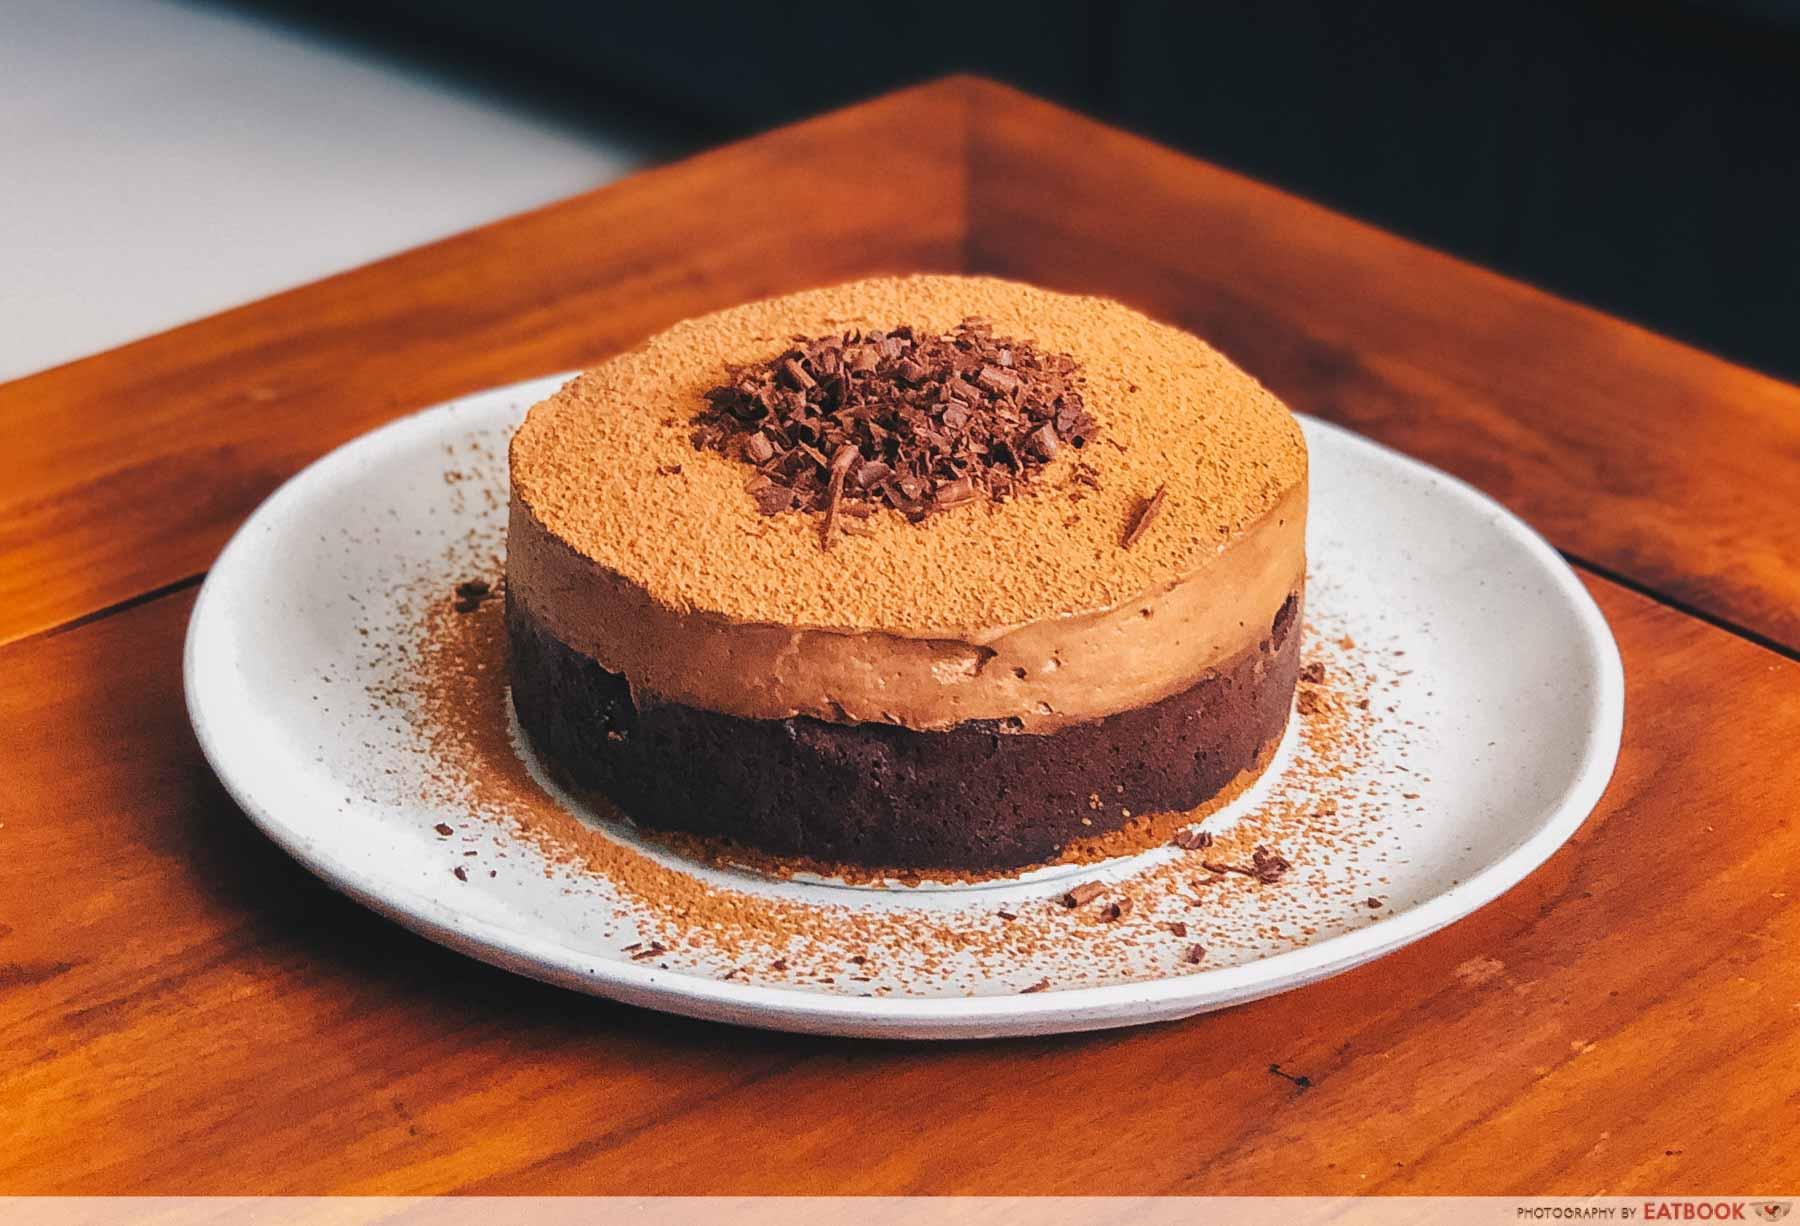 Milo Recipes - Milo Brownie Mousse Cake